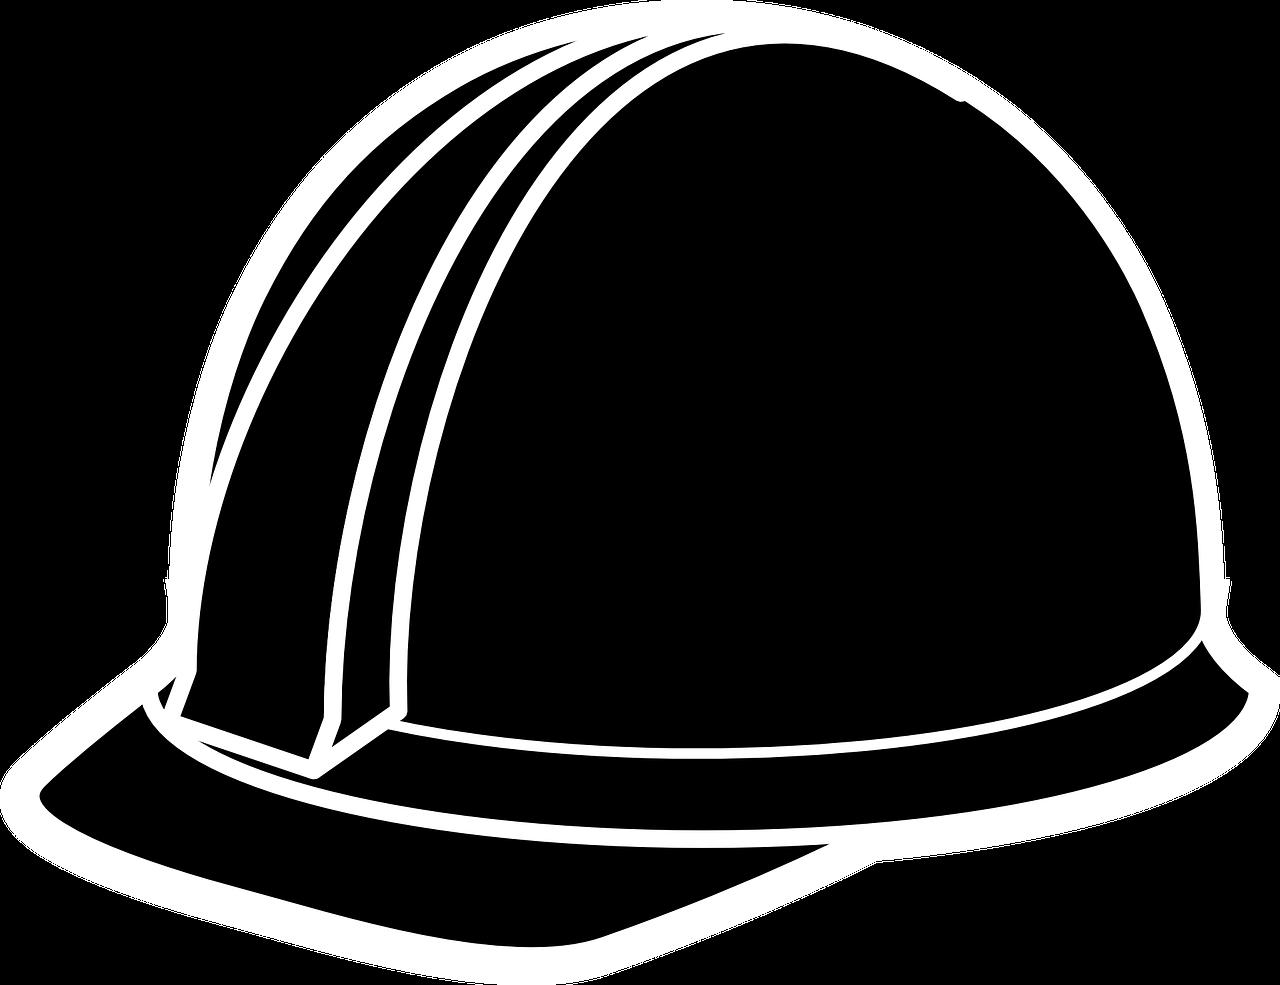 Hard-Hat Black Construction - Free vector graphic on Pixabay